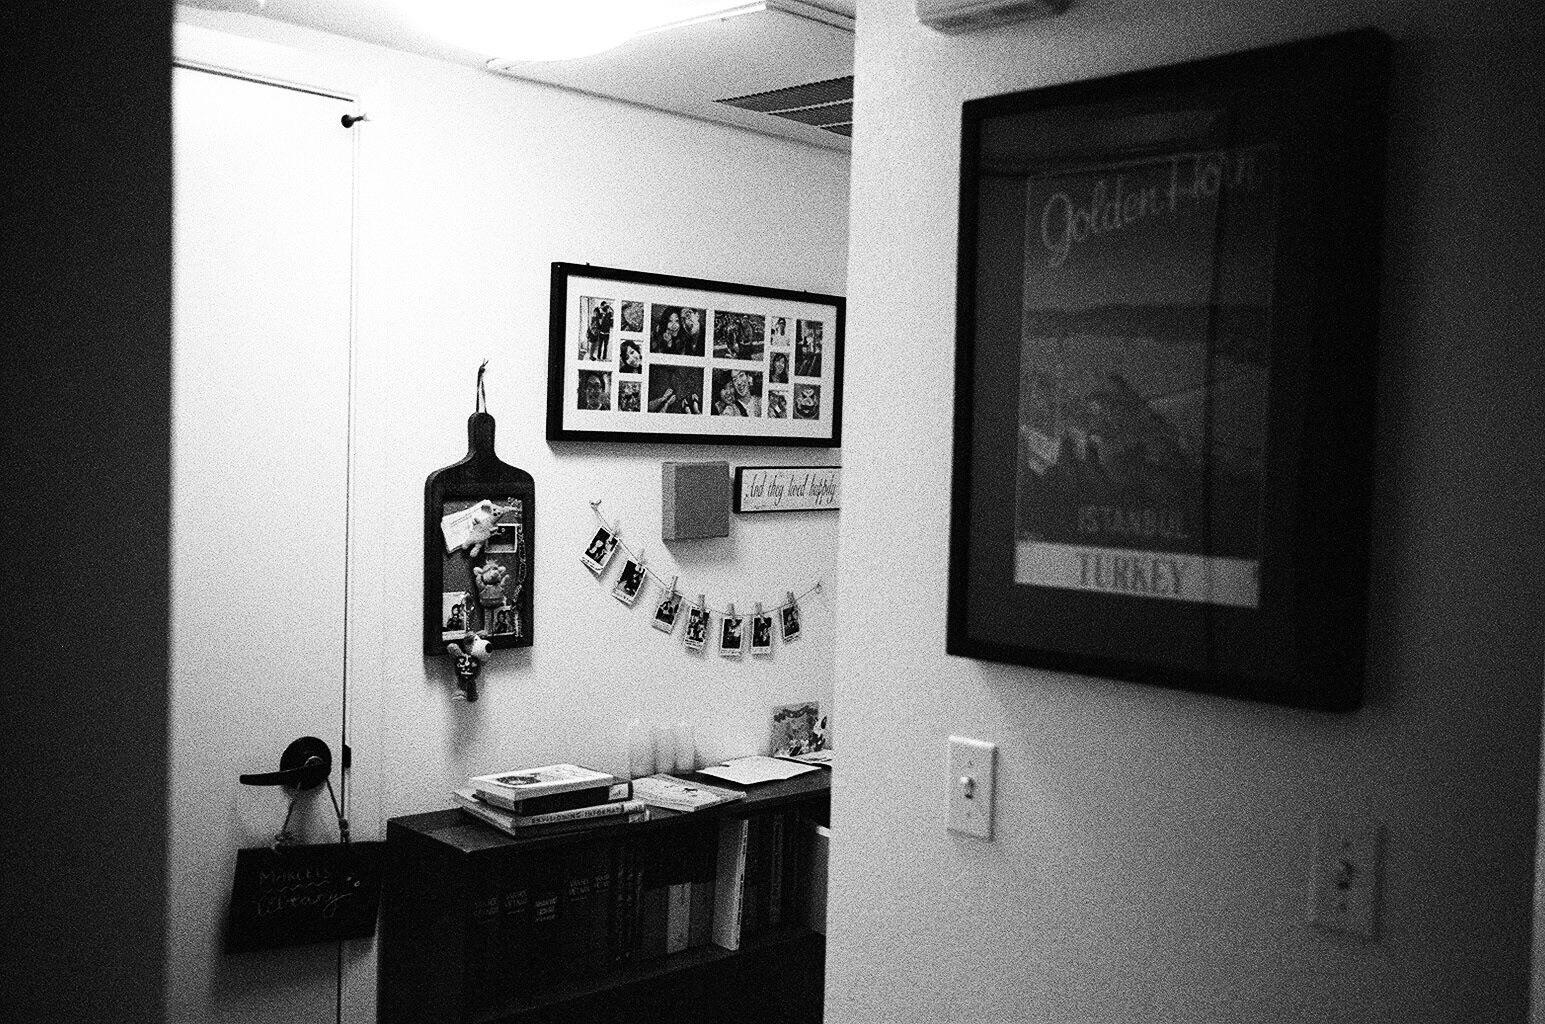 eric kim photography black and white tri x 1600 leica mp 35mm film-1001